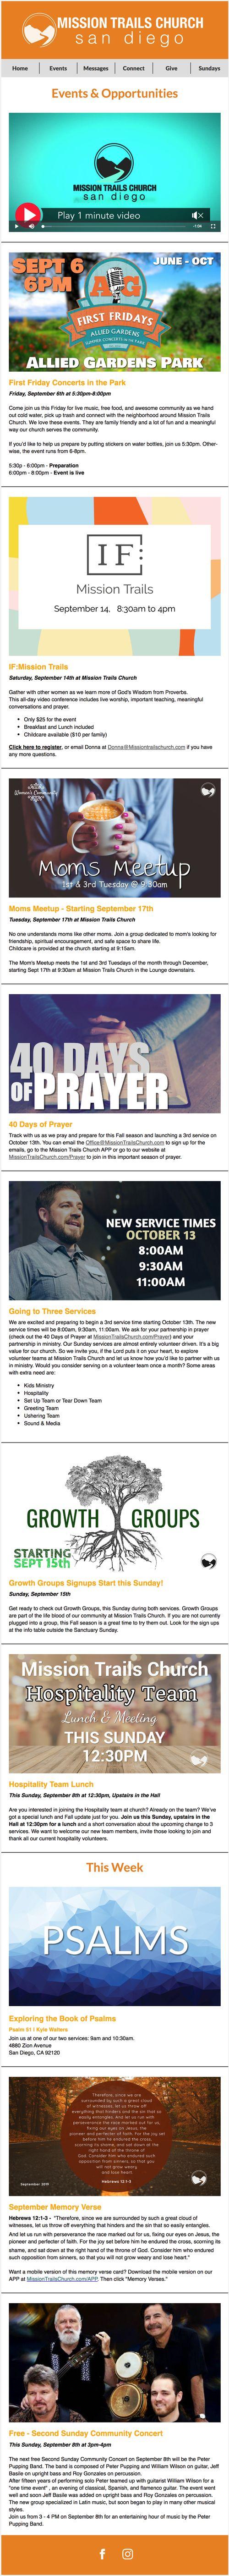 Mission Trails Church - Mission Trails Weekly